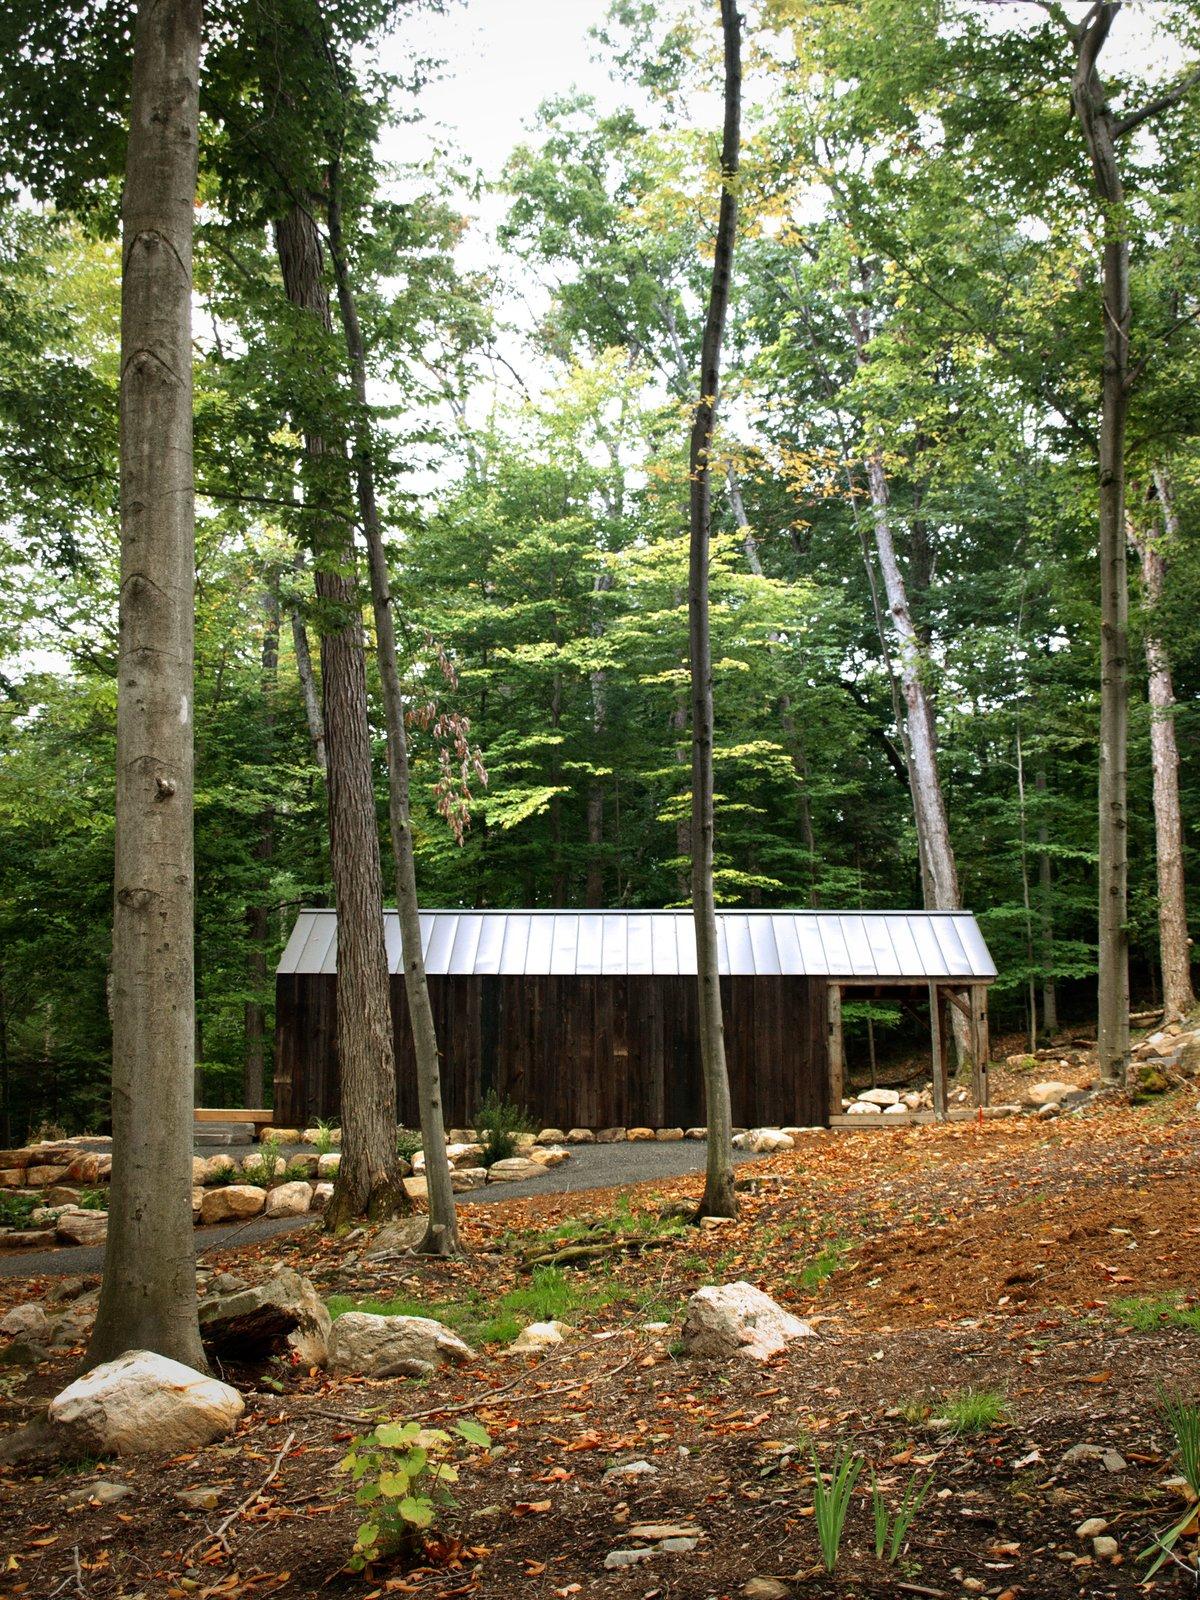 #outdoor #garden #interior #exterior #tree #wood #forest #bigwinisland #bunkieyogastudio #yoga #aluminumroof #roof #woodcladding #cladding  Photo courtesy of Jorge Torres  Cabins & Hideouts by Stephen Blake